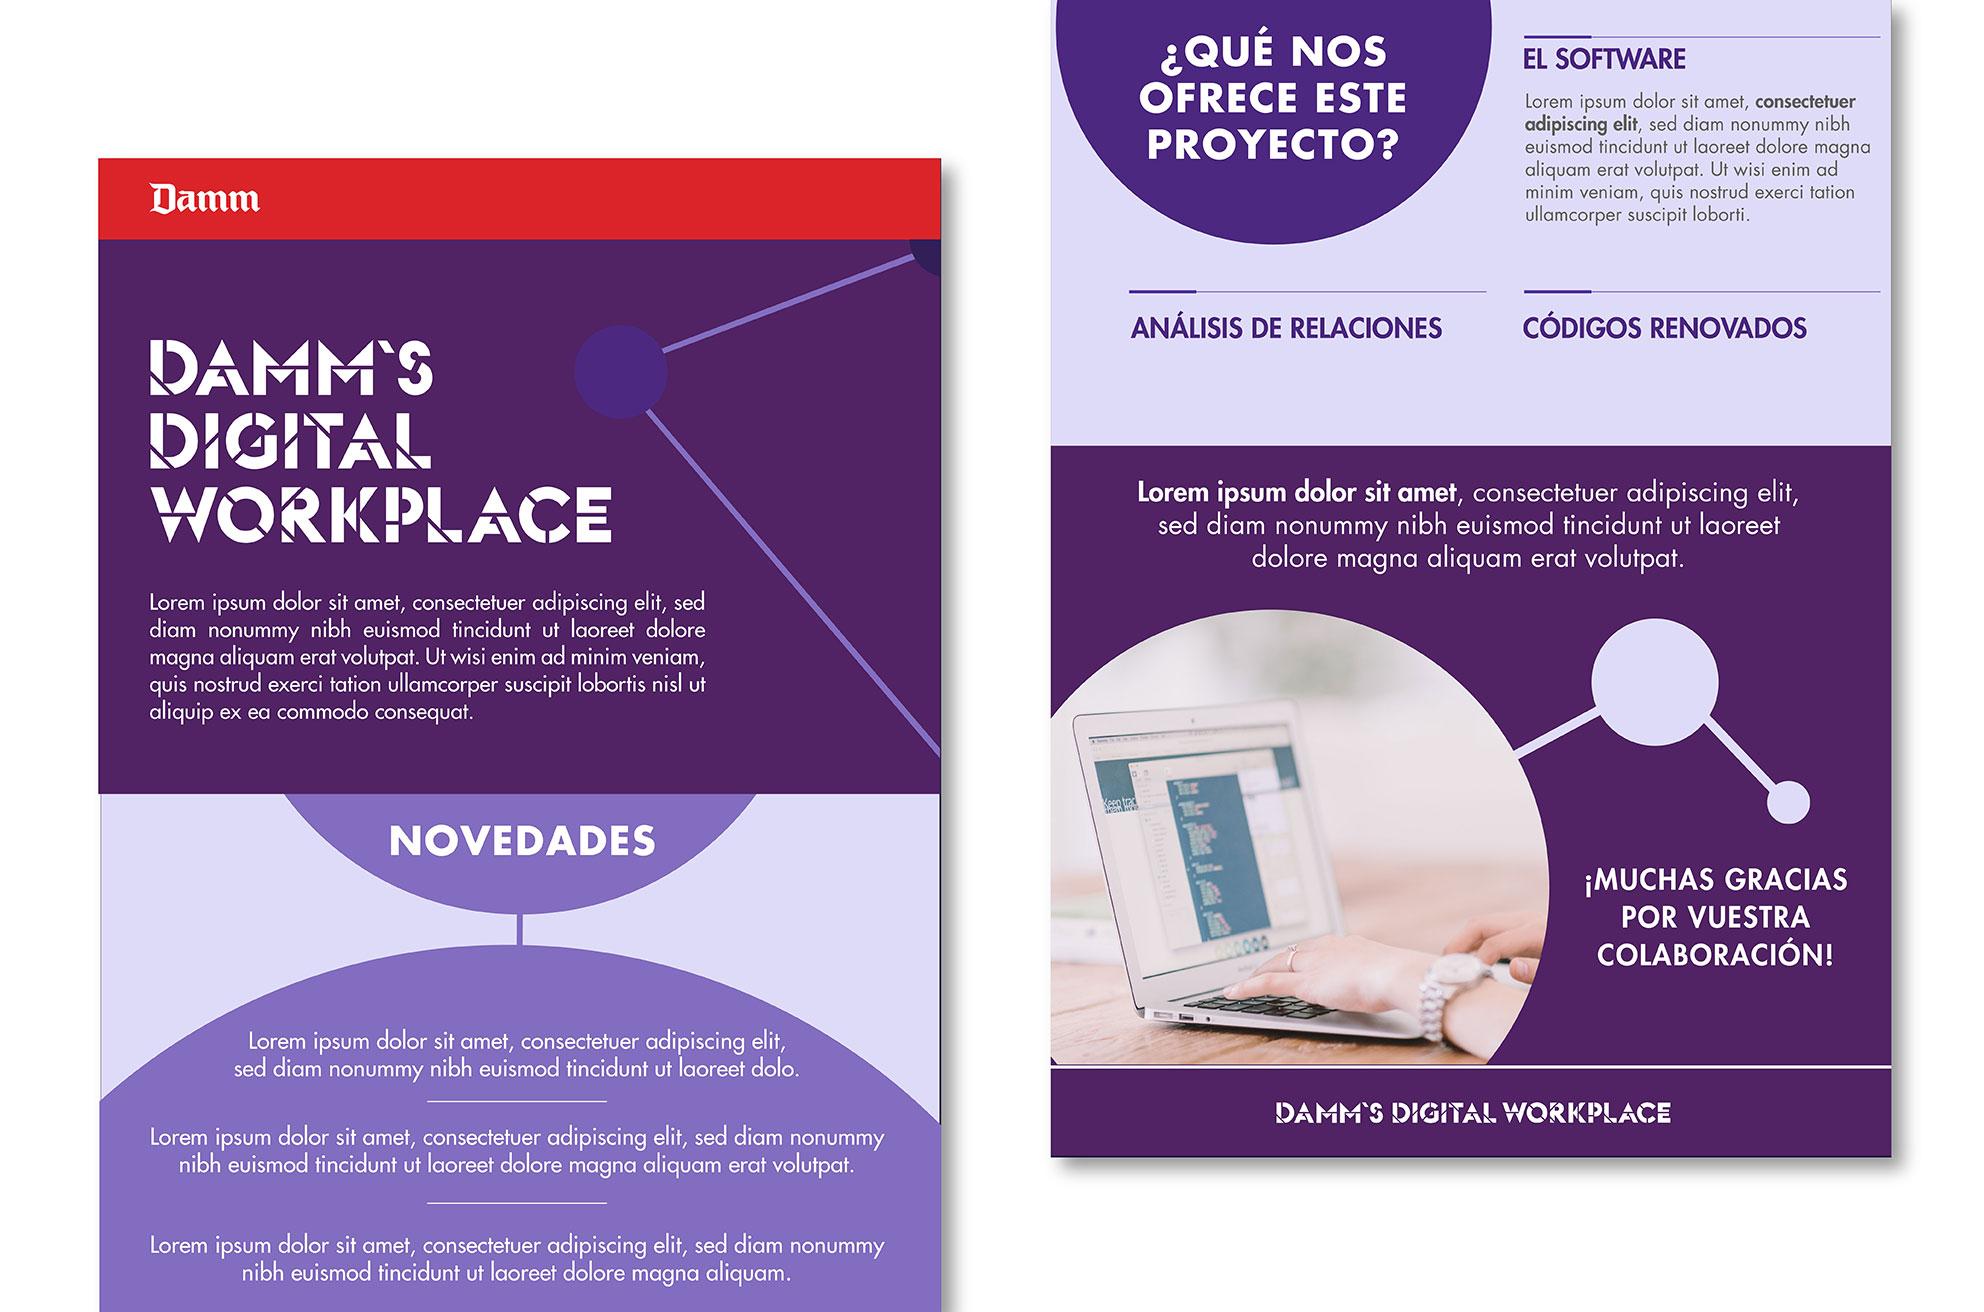 Damm-Digital-Workplace-Damm-diseñografico-agencia-barcelona-2